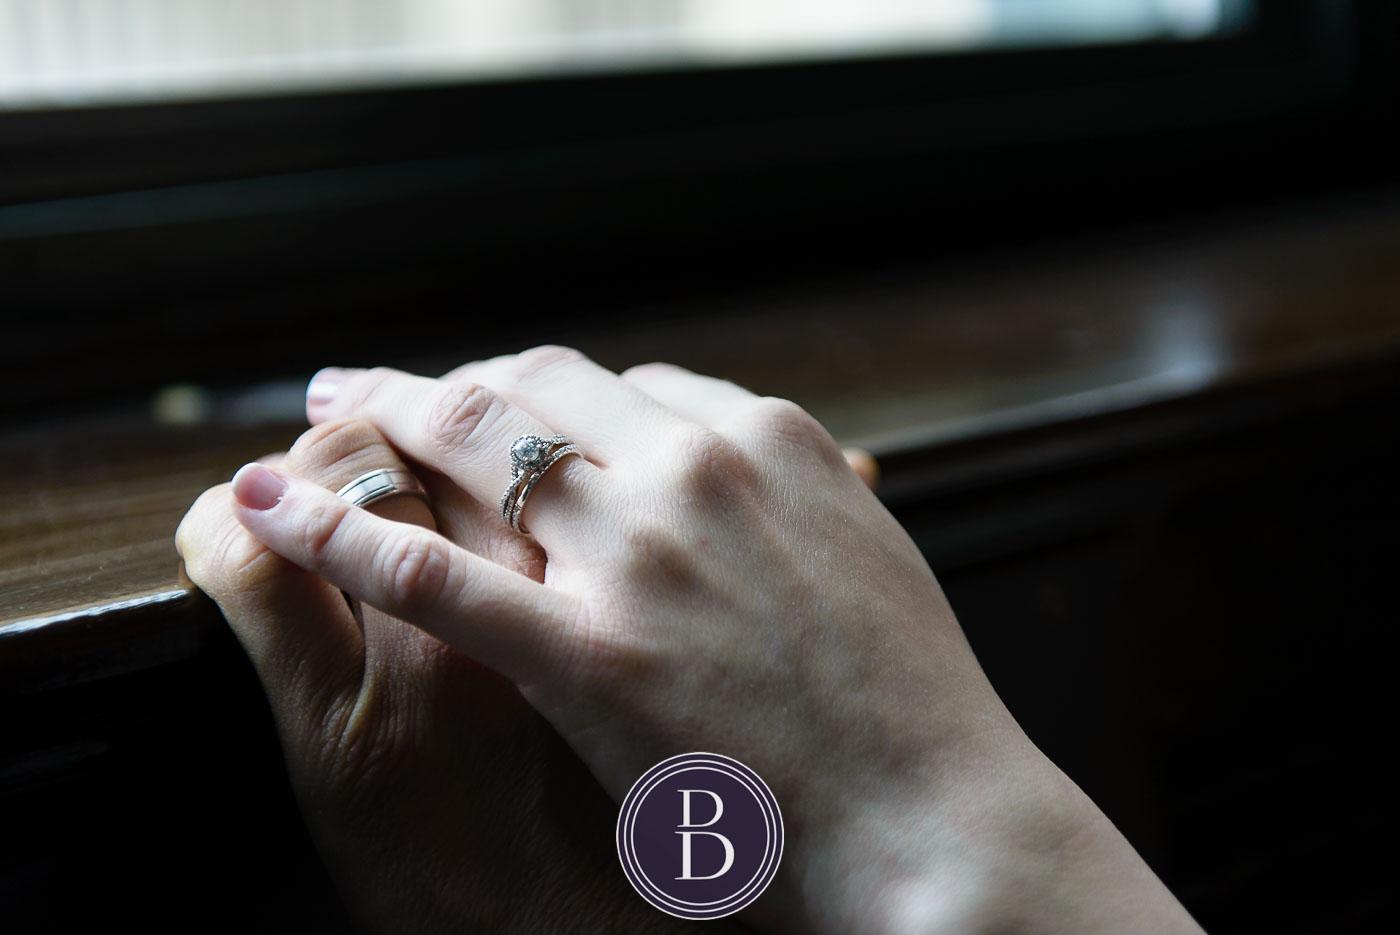 wedding bands holding hands